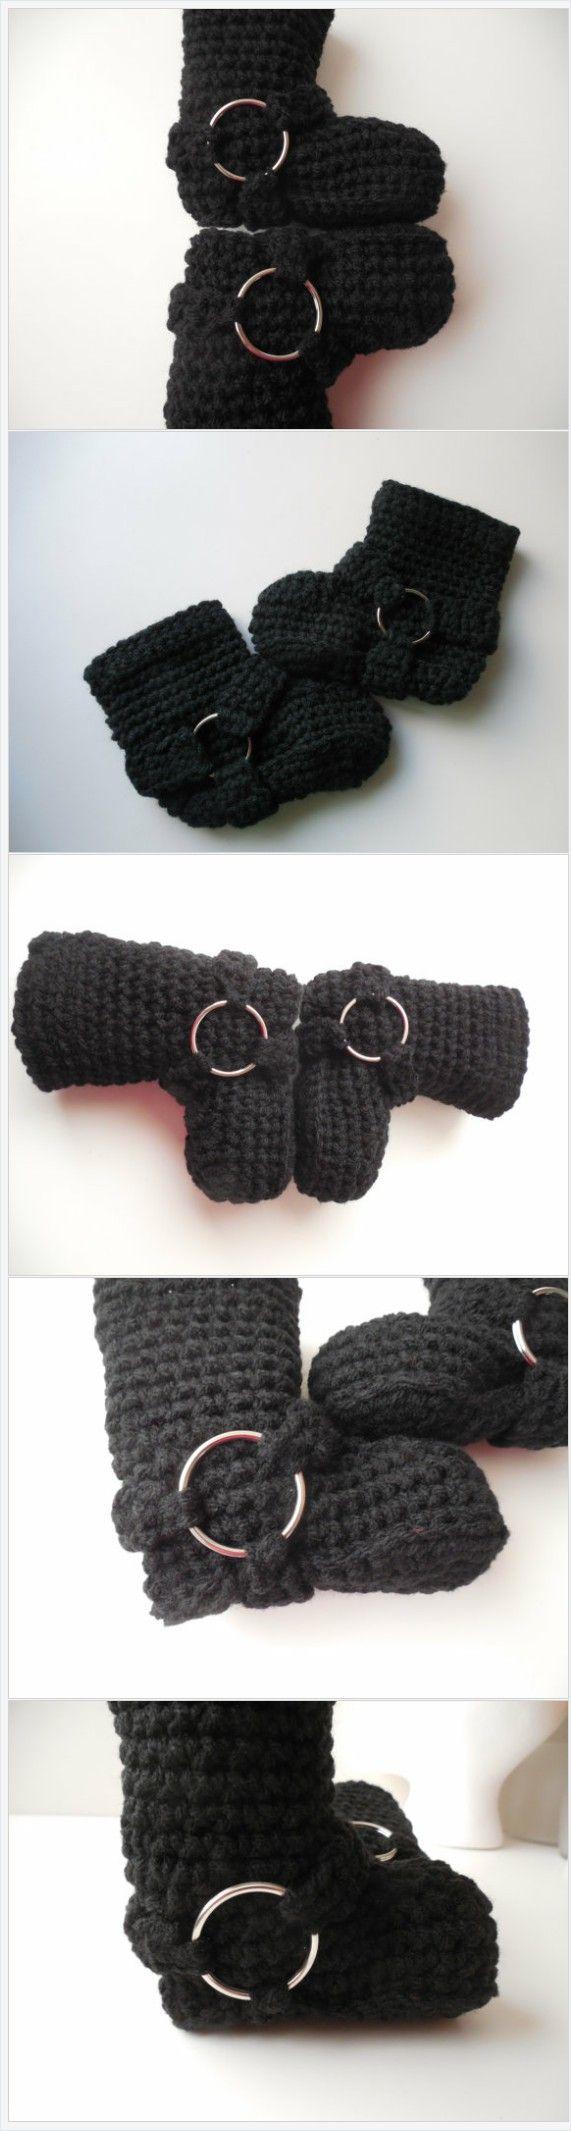 Biker Baby Booties - Black - Crochet - Handmade - Biker Baby Photo Prop - Made to Order https://www.etsy.com/listing/186976109/